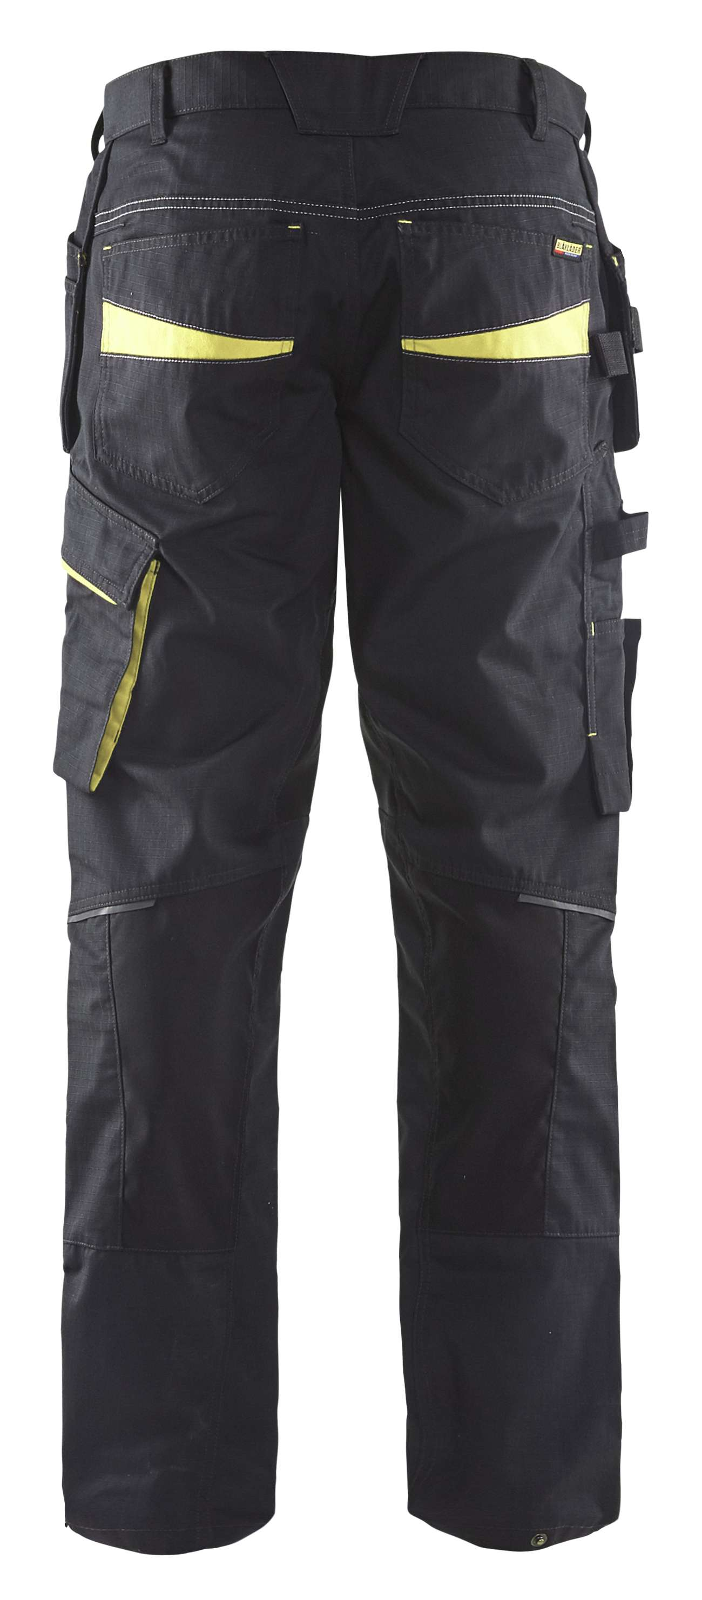 Blaklader Werkbroeken 14961330 met Stretch zwart-geel(9933)